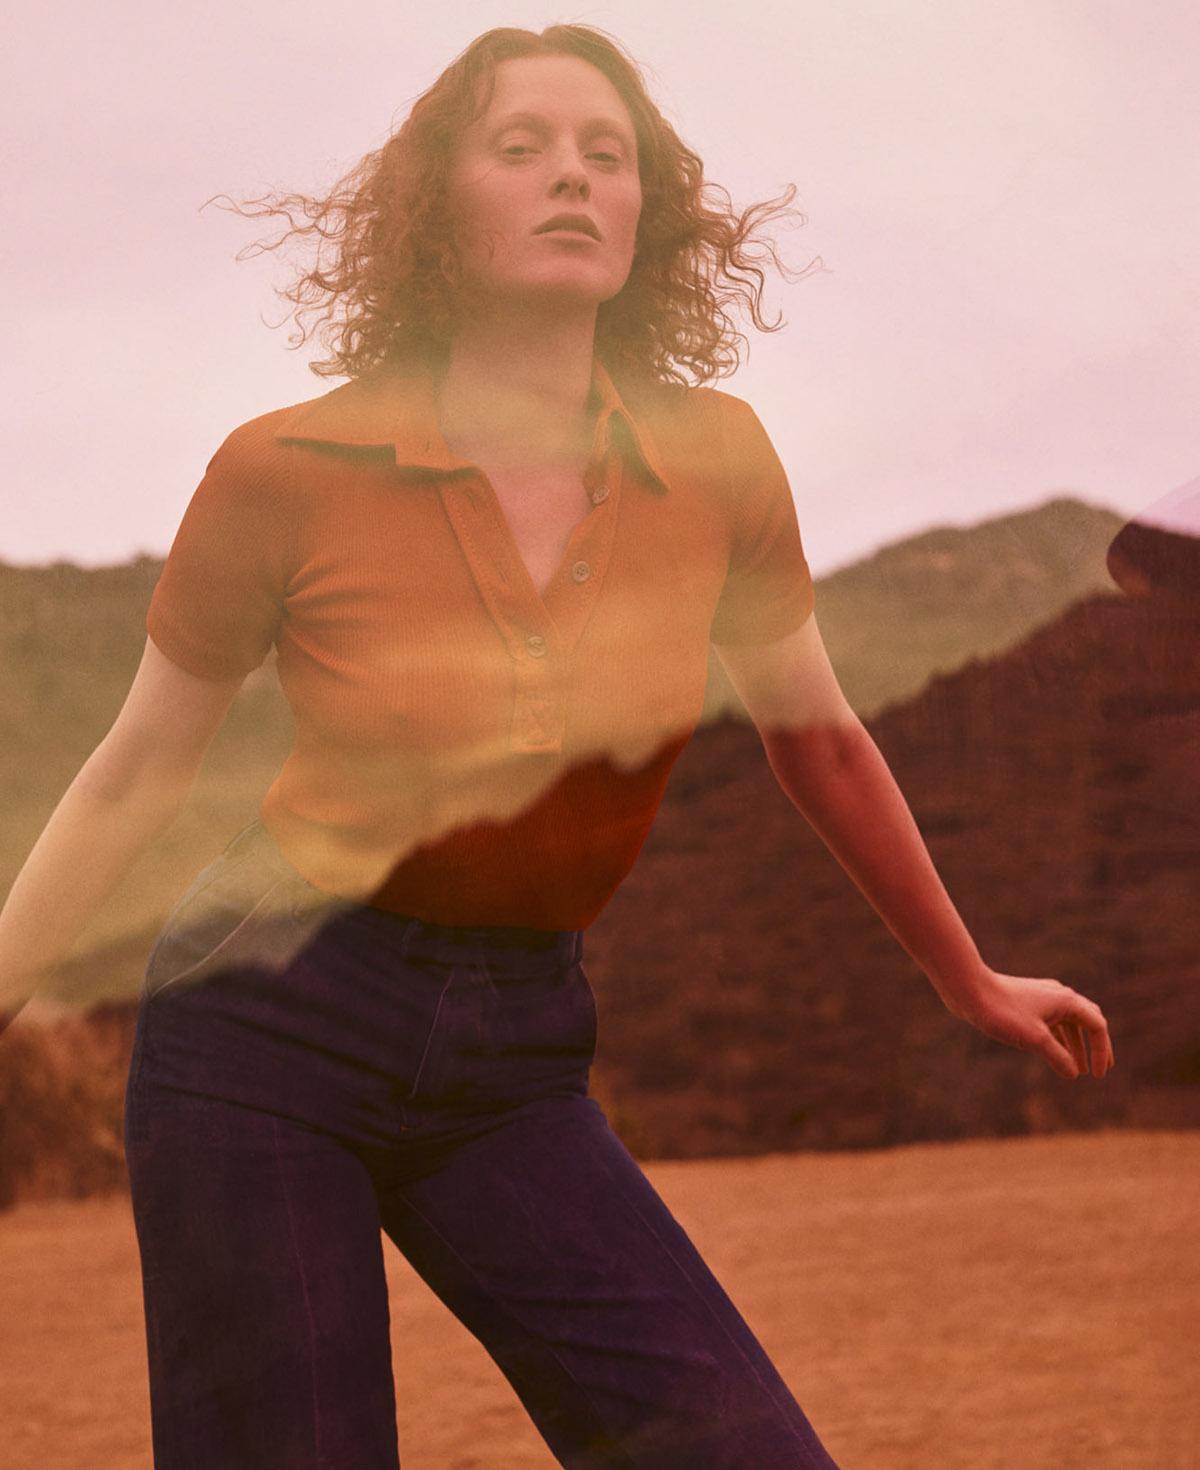 Karen Elson by Zoey Grossman for Elle US March 2021